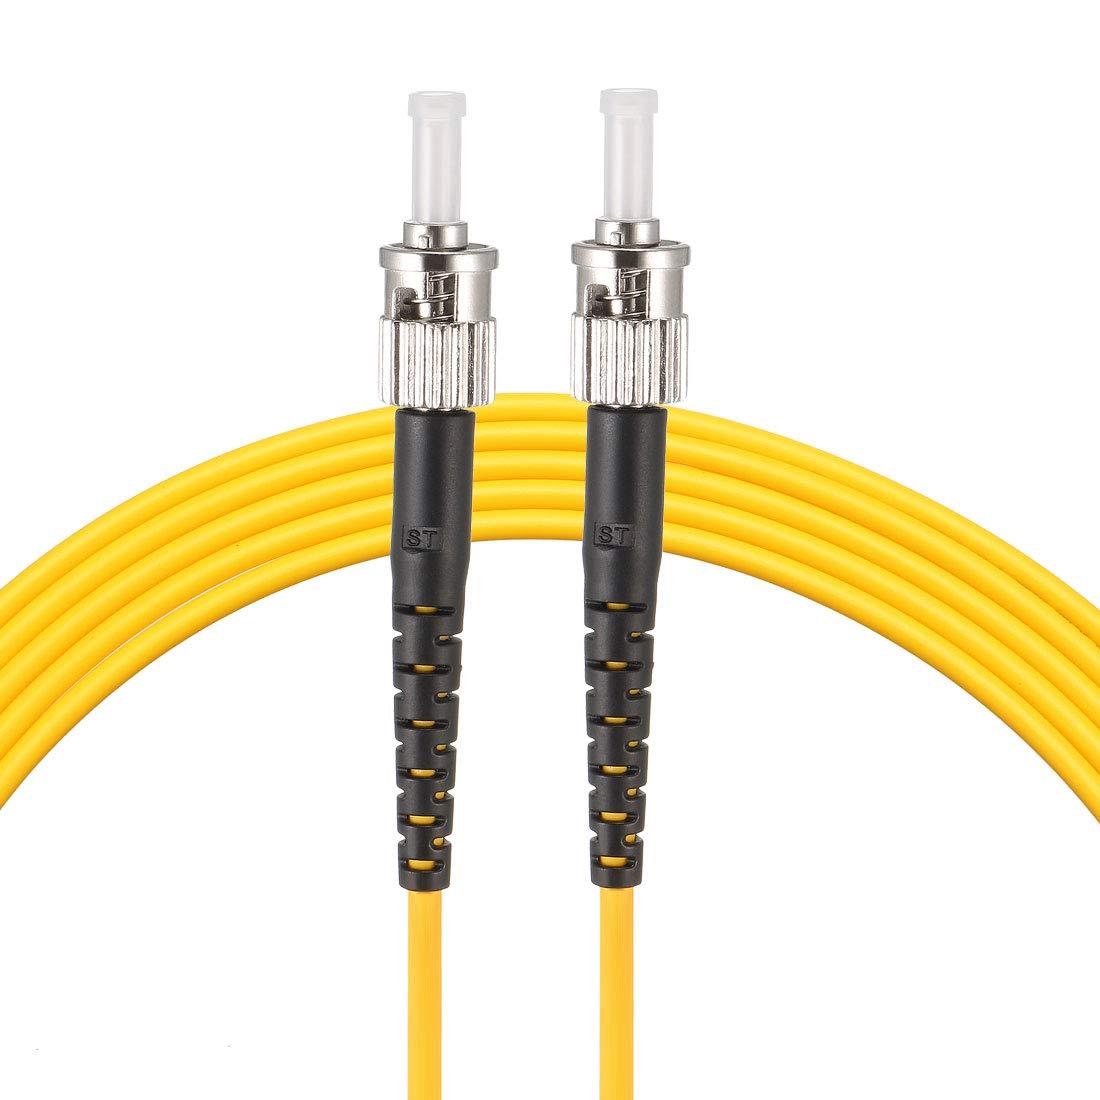 uxcell 5M 16.5Ft ST to ST Duplex Fiber Optic Cable Jumper Optical Patch Cord ST-ST 2pcs